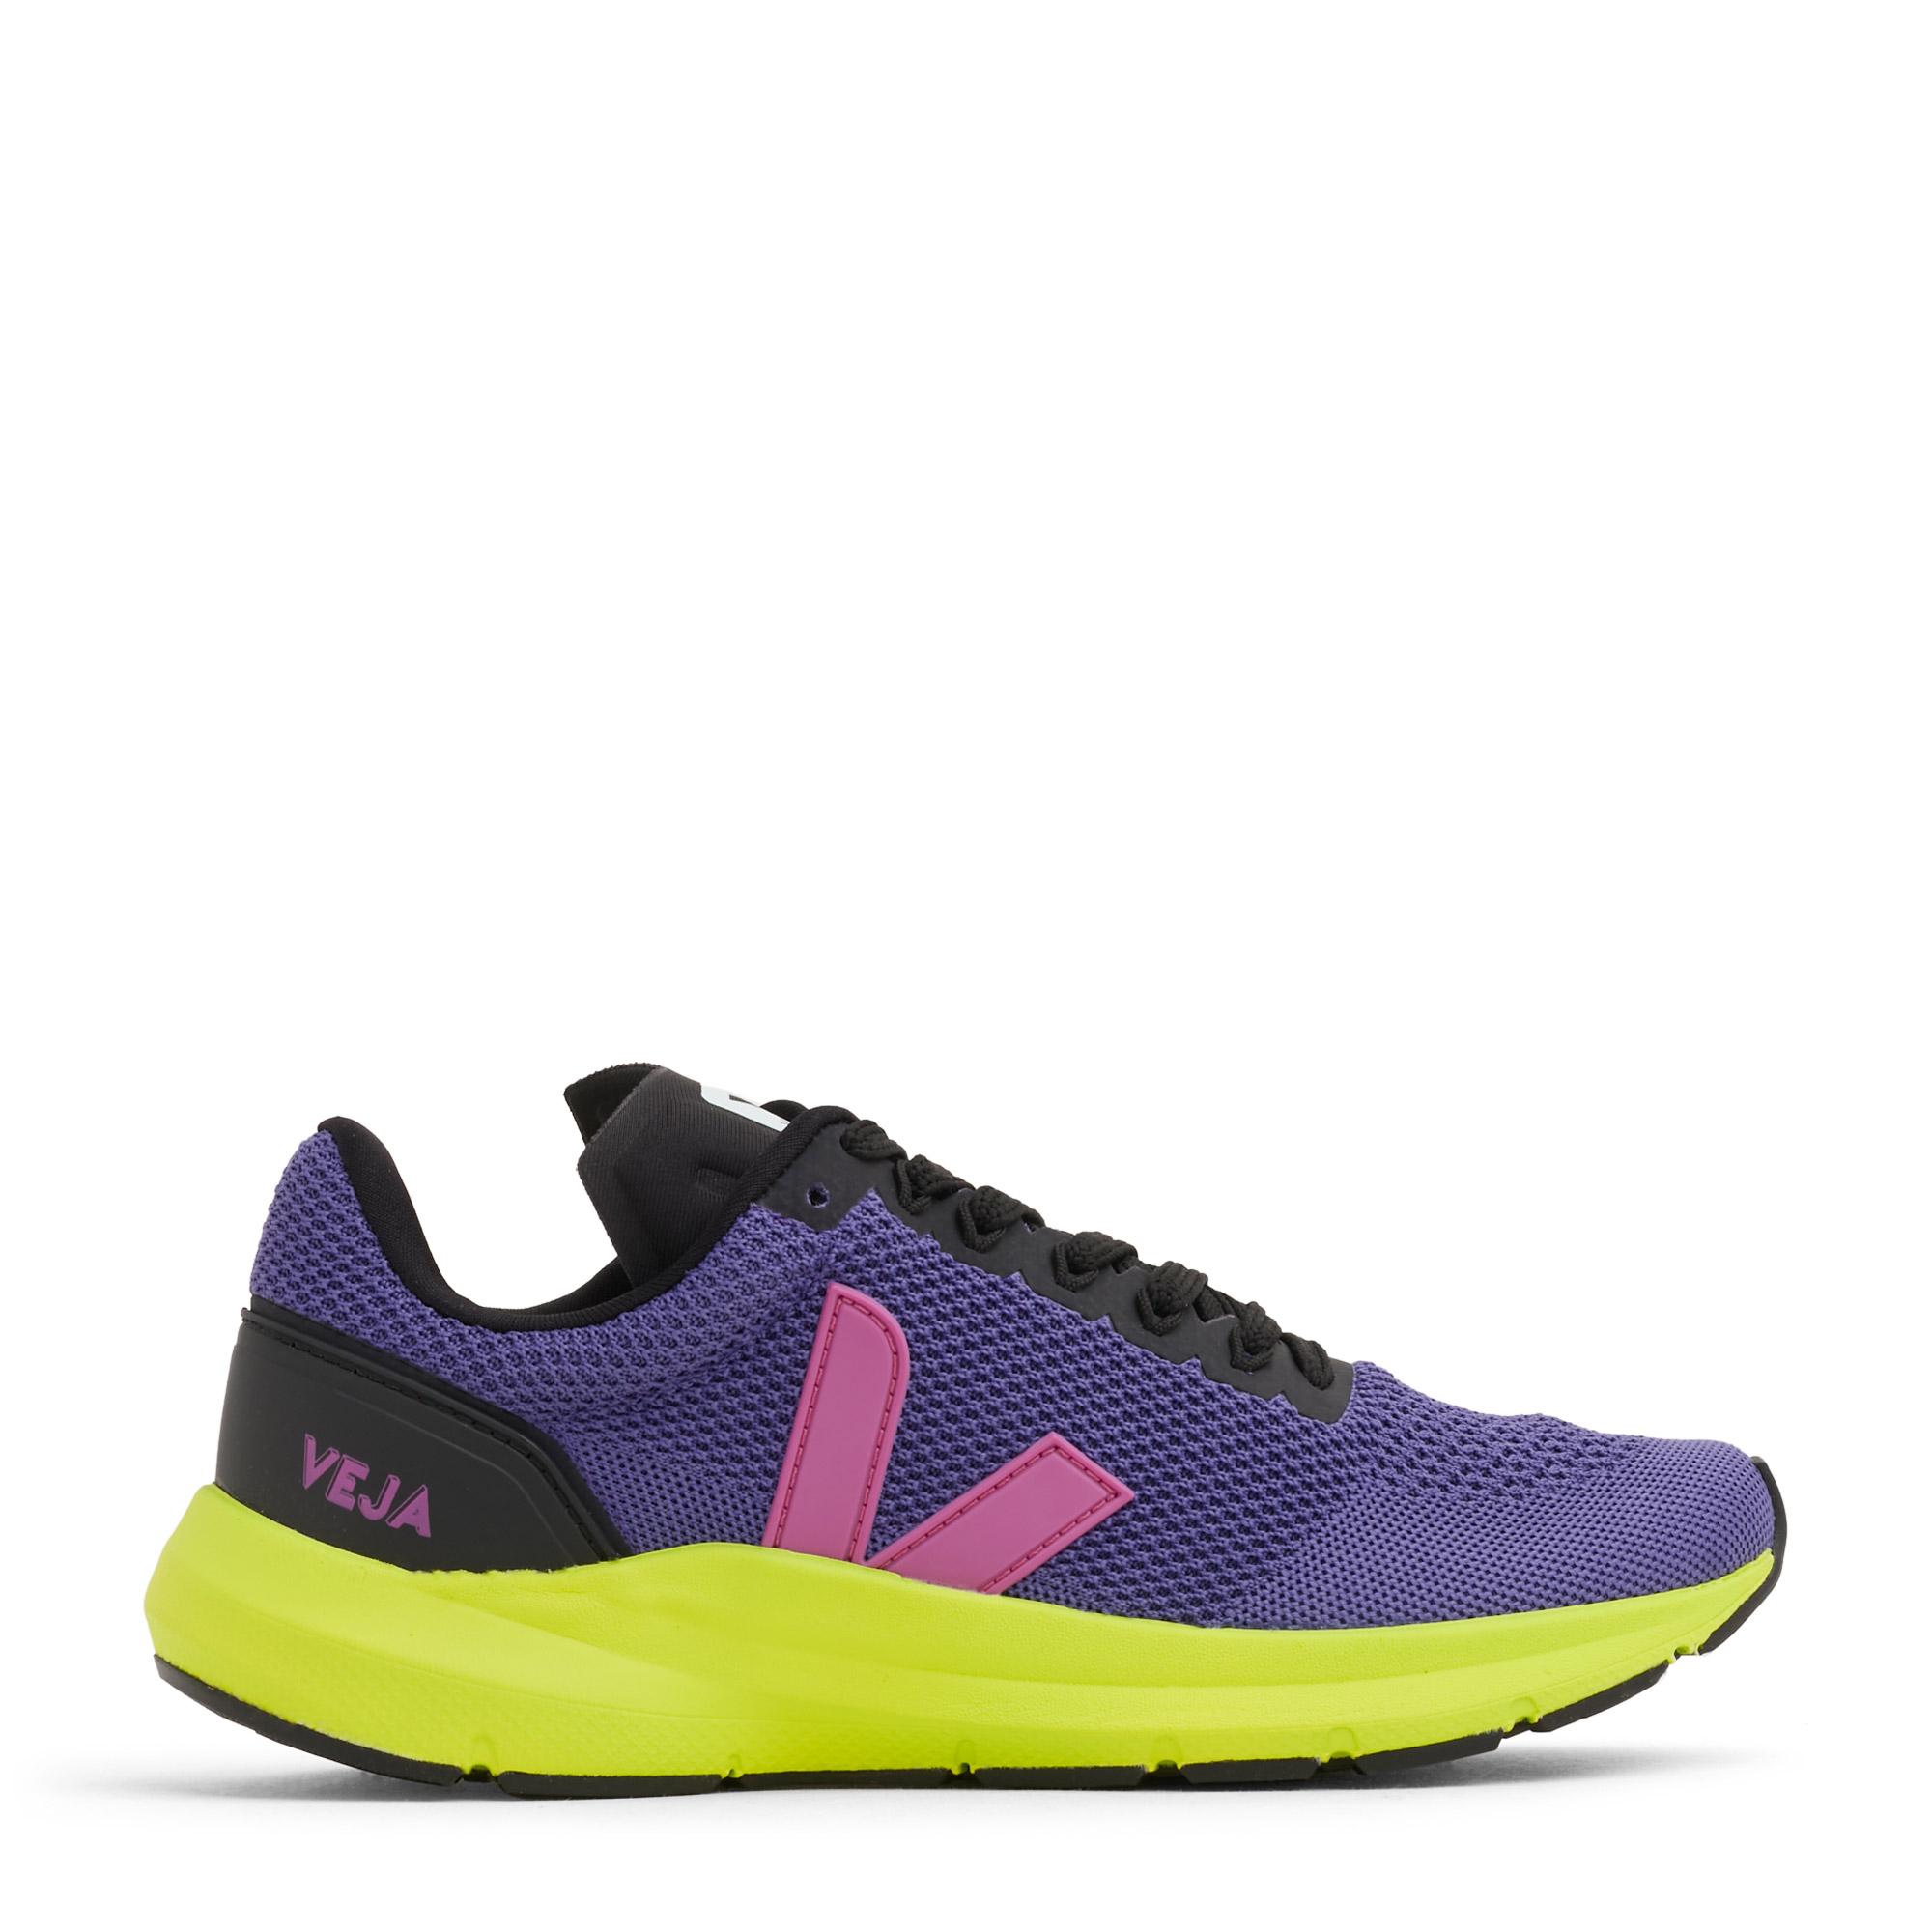 Marlin V-Knit sneakers